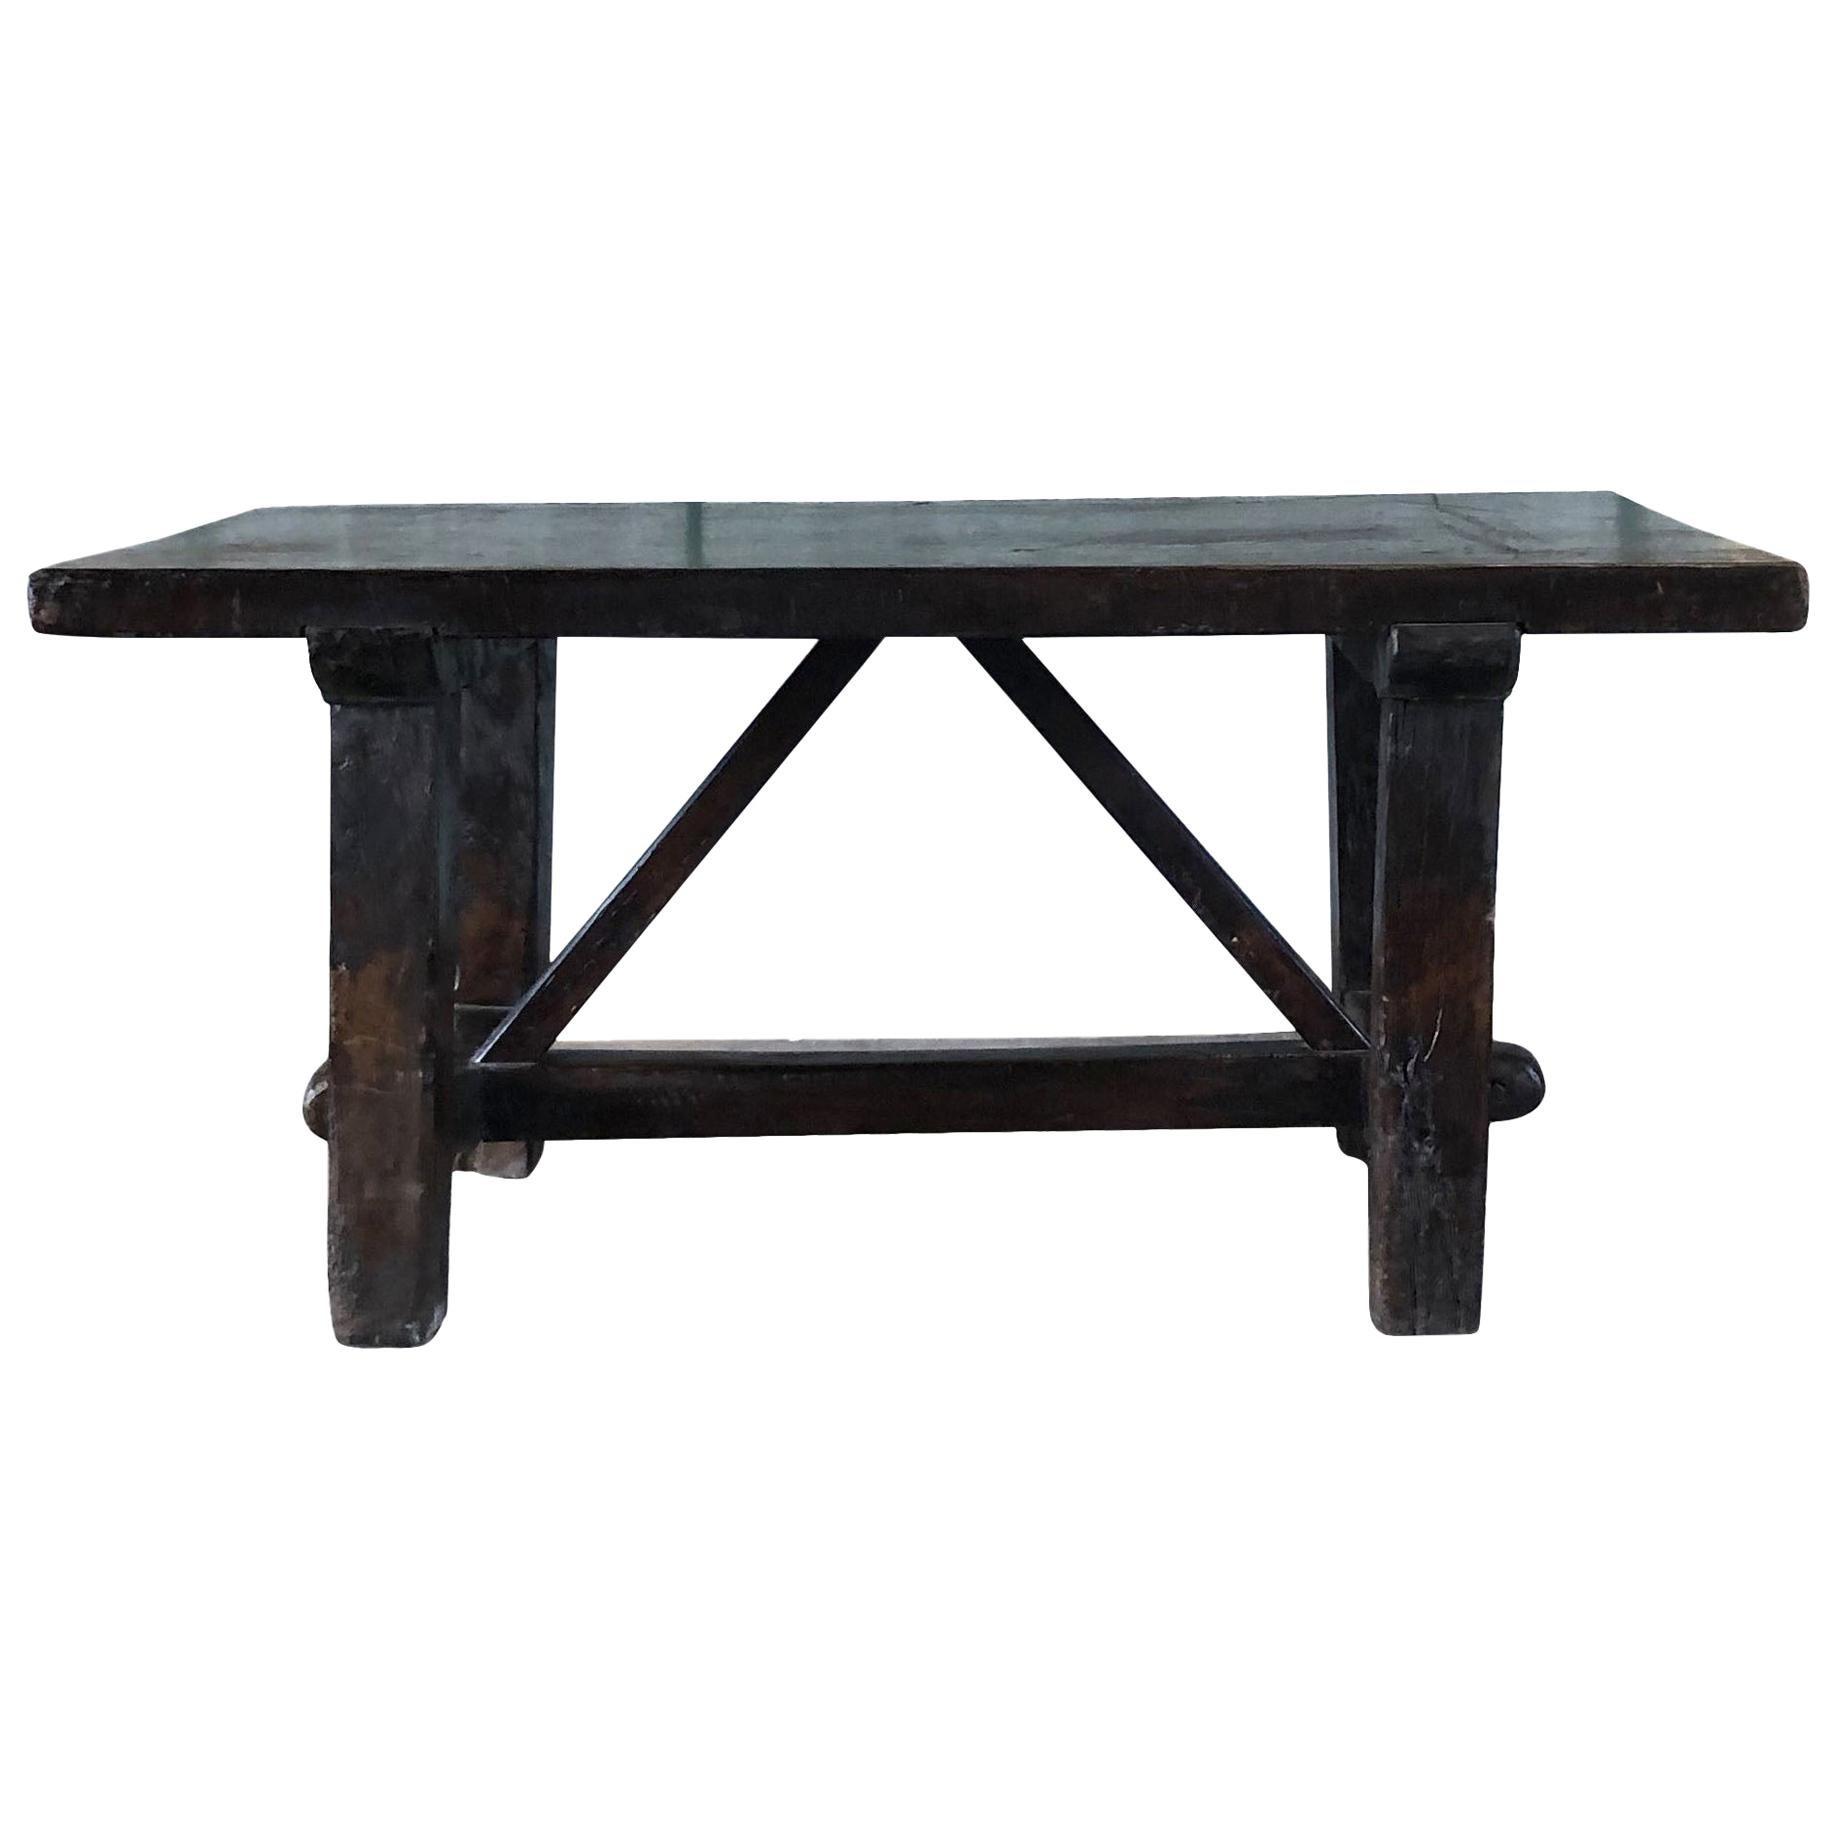 18th Century Tuscan Walnut Kitchen Table, Italian Dark Waxed Farm Table